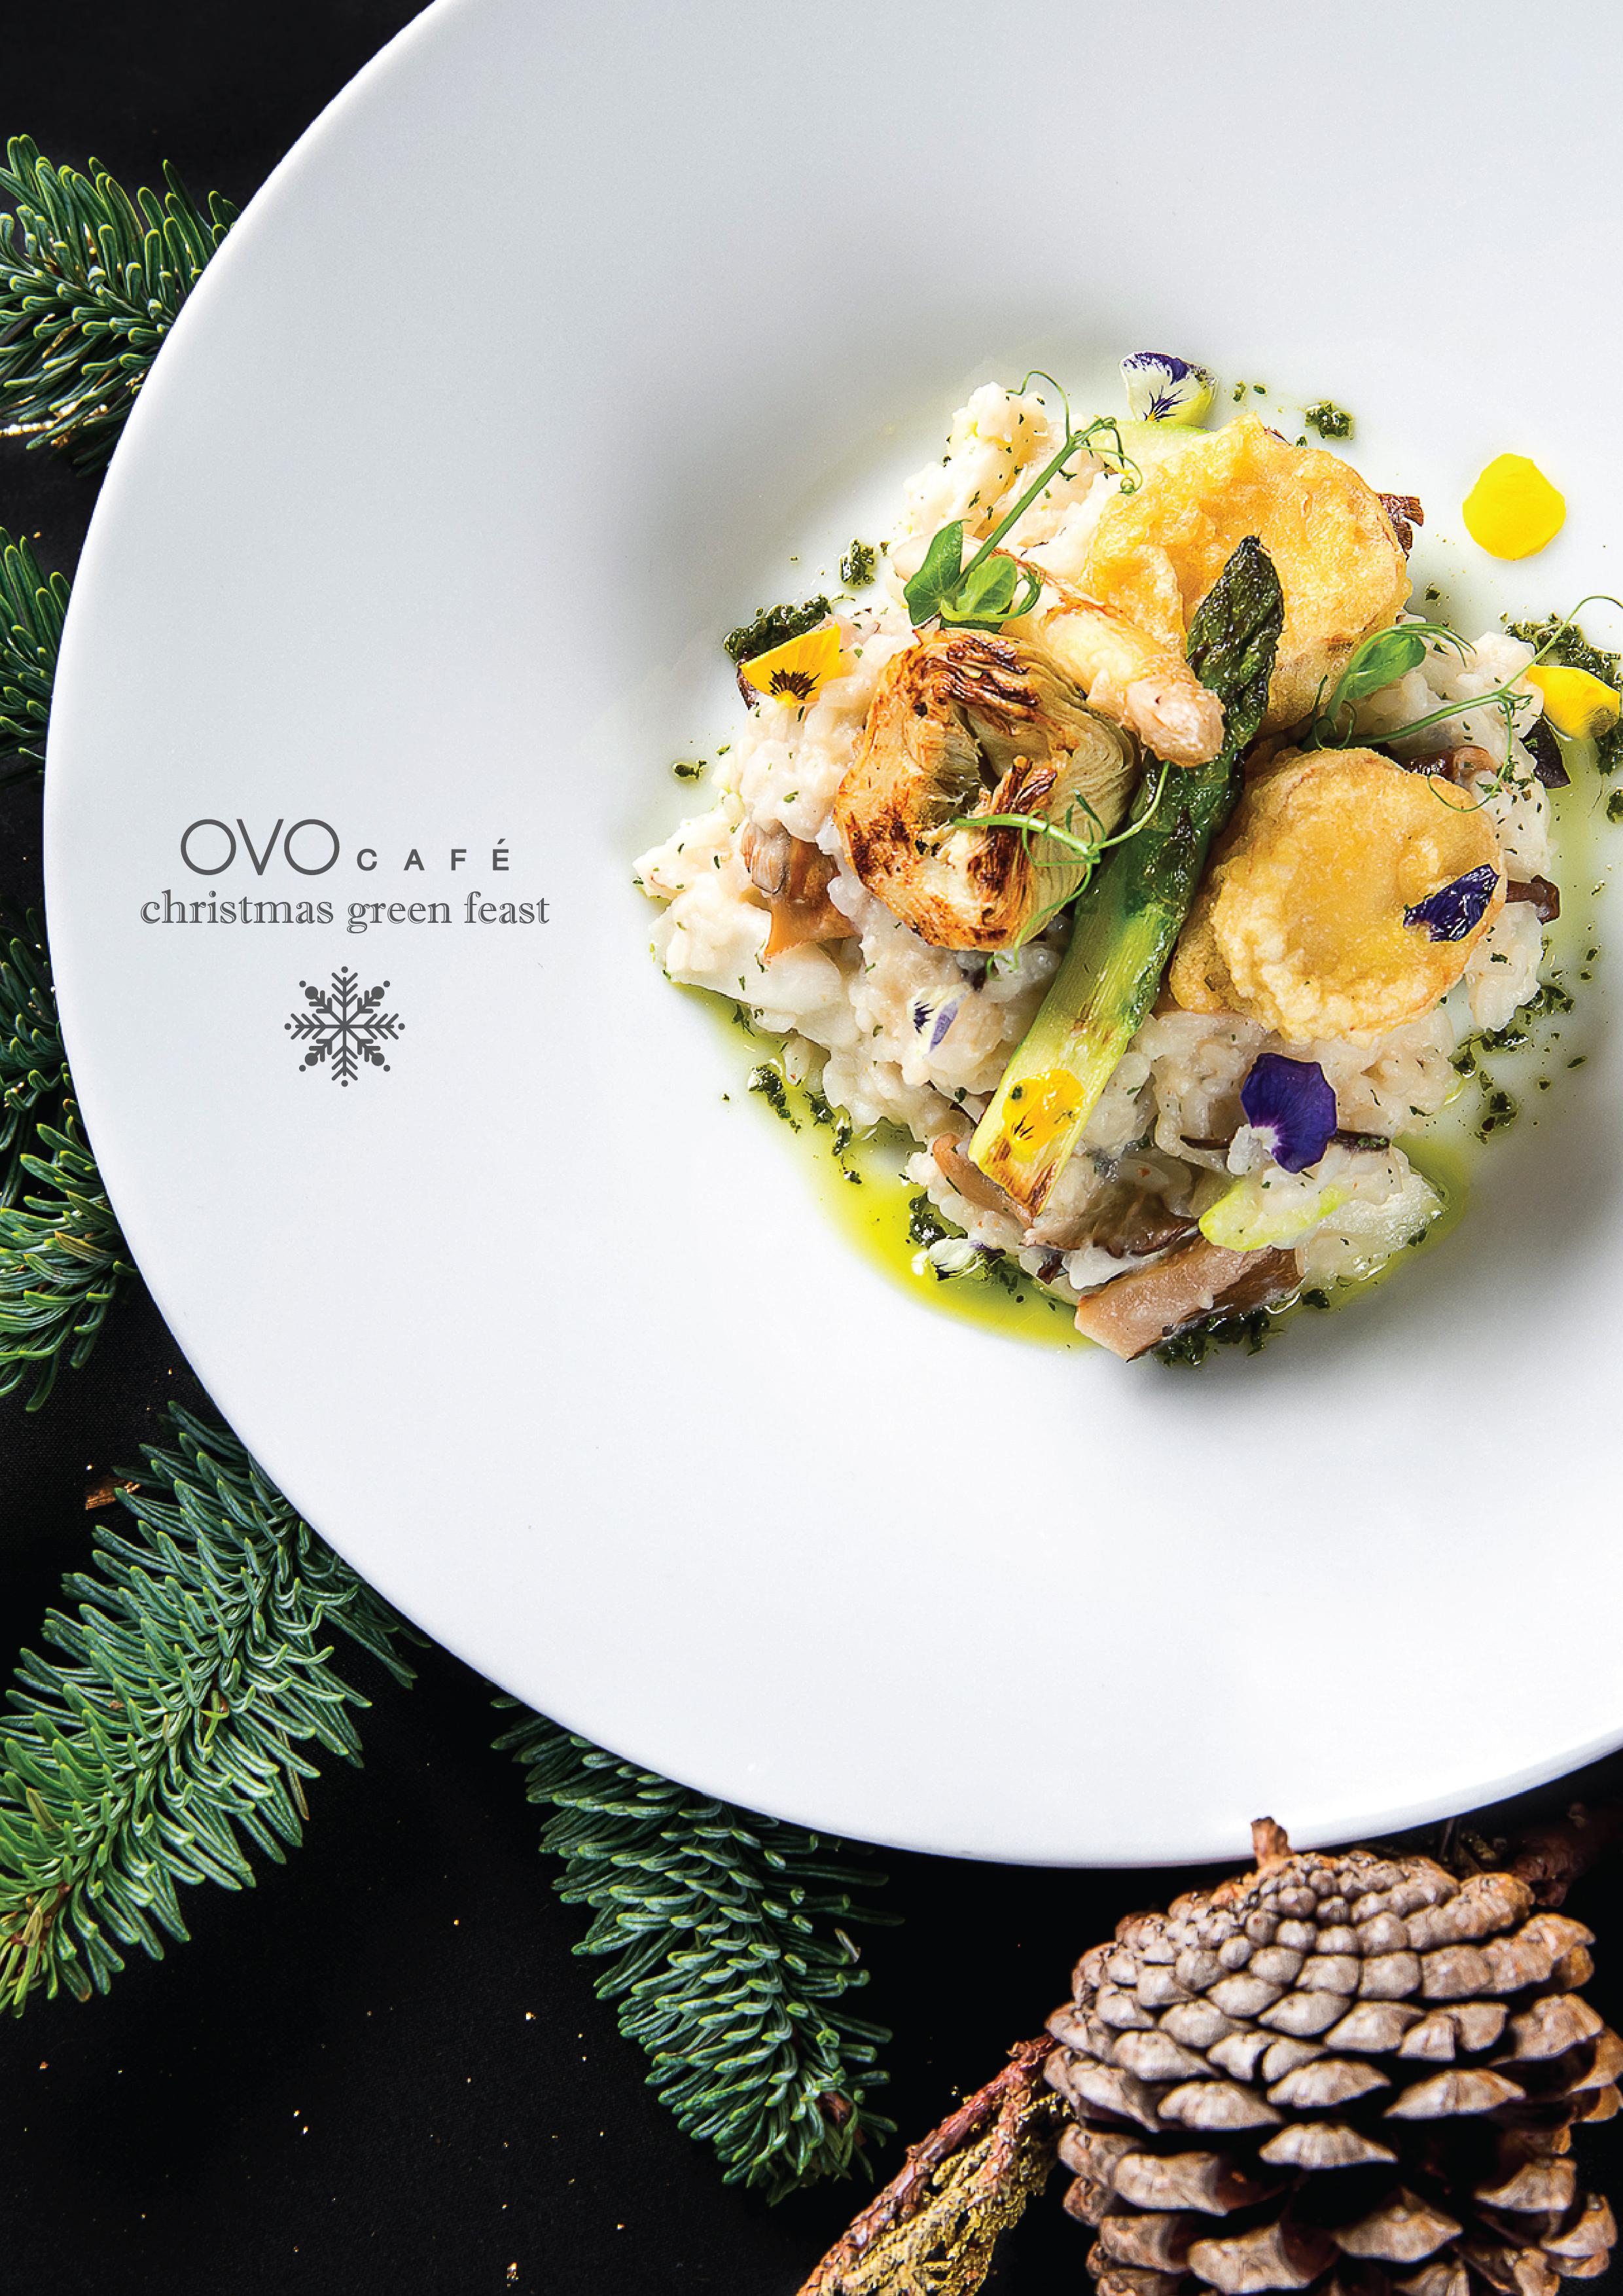 risotto with cauliflower cream sauce 椰菜花忌廉汁意大利飯